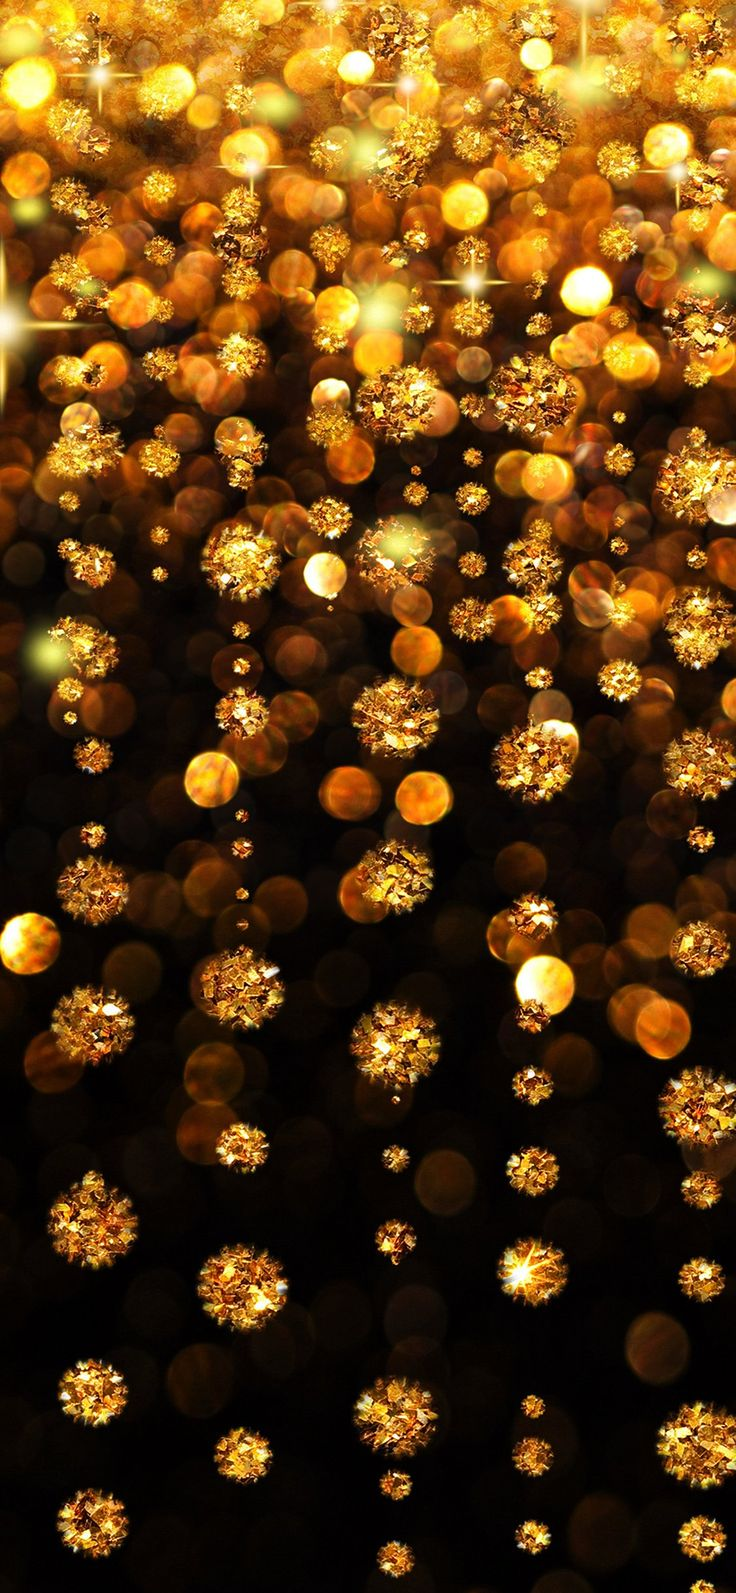 2018 Iphone Wallpapers صور خلفيات ايفون Hd روعه Tecnologis Iphone Wallpaper Lights Wallpaper Iphone Christmas Iphone Wallpaper